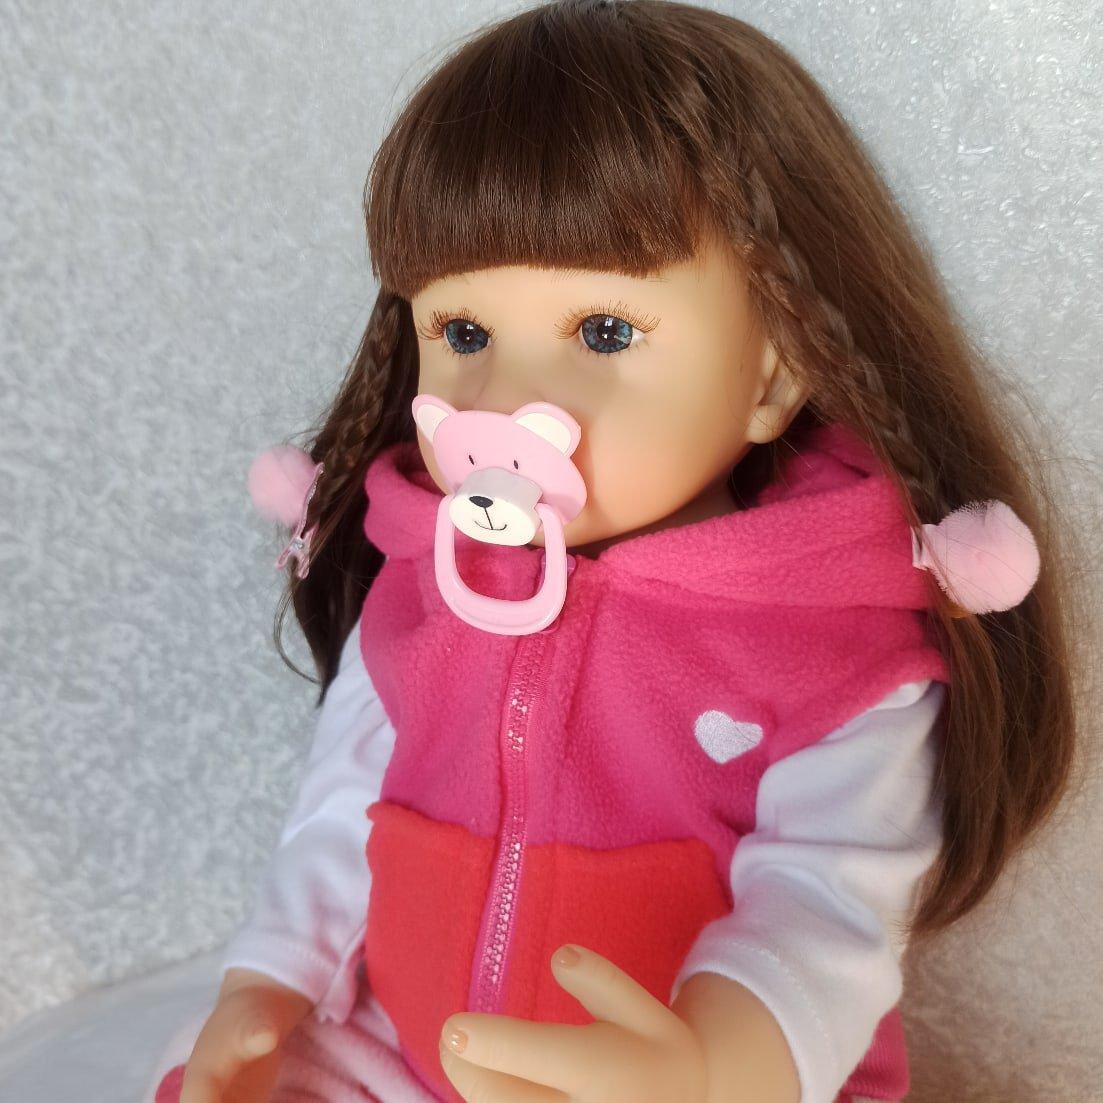 Красивая реалистичная кукла бренда NPK - aliexpress